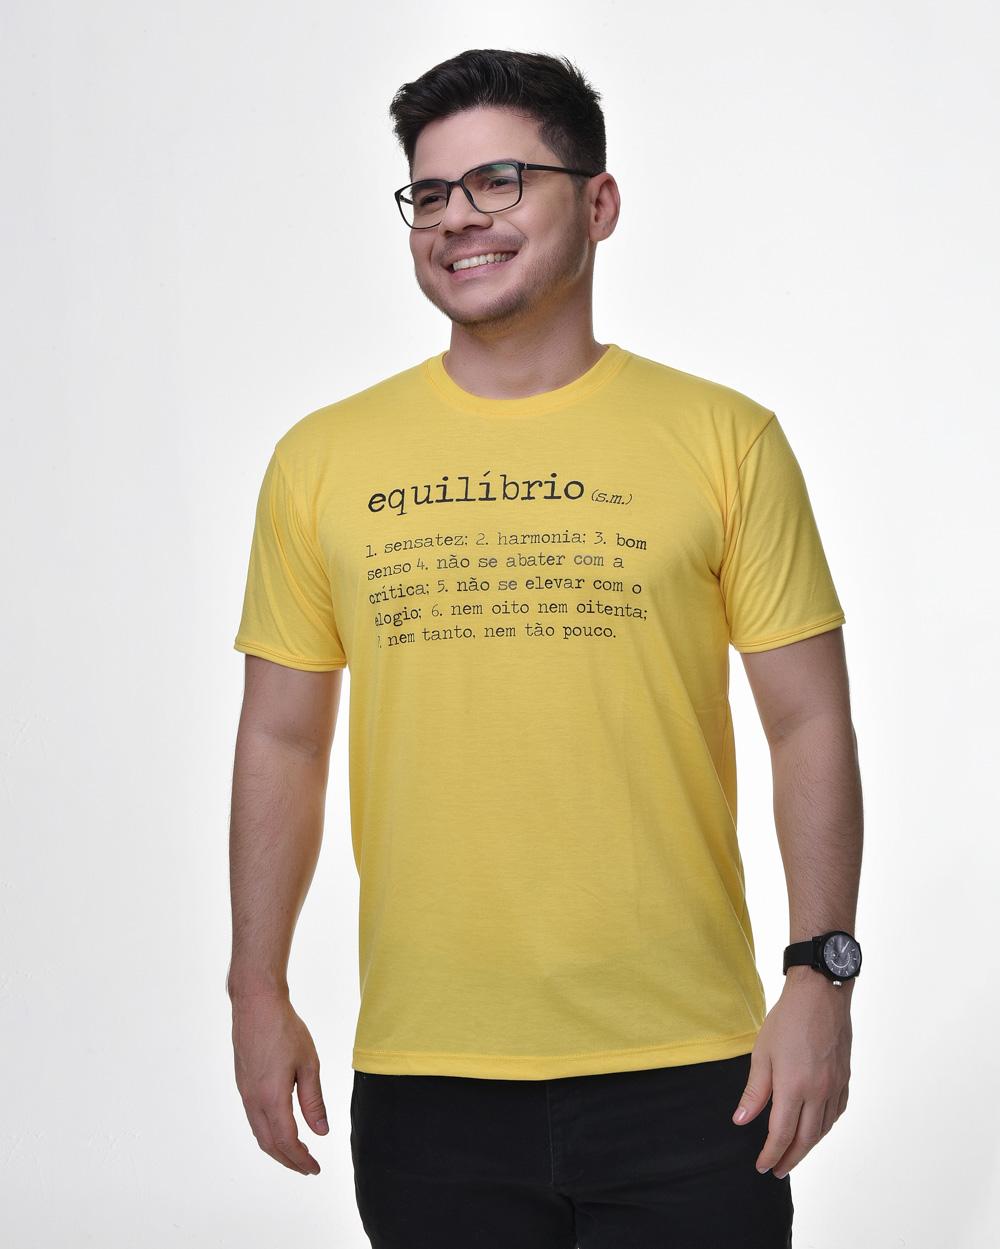 Camiseta Tradicional - Equilíbrio